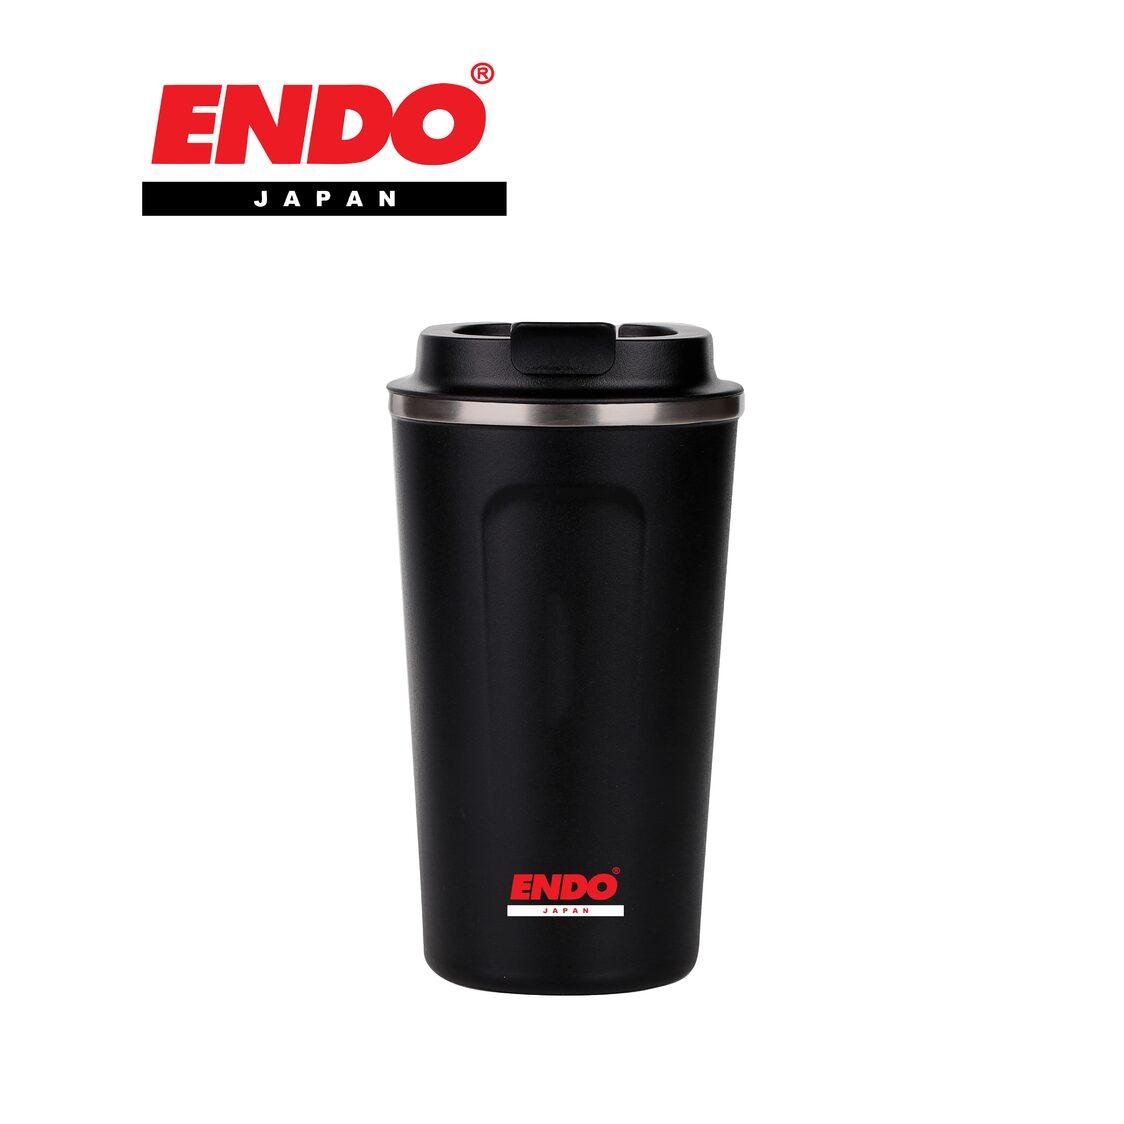 Endo Double Stainless Steel Coffee Mug 500ml CX-3010